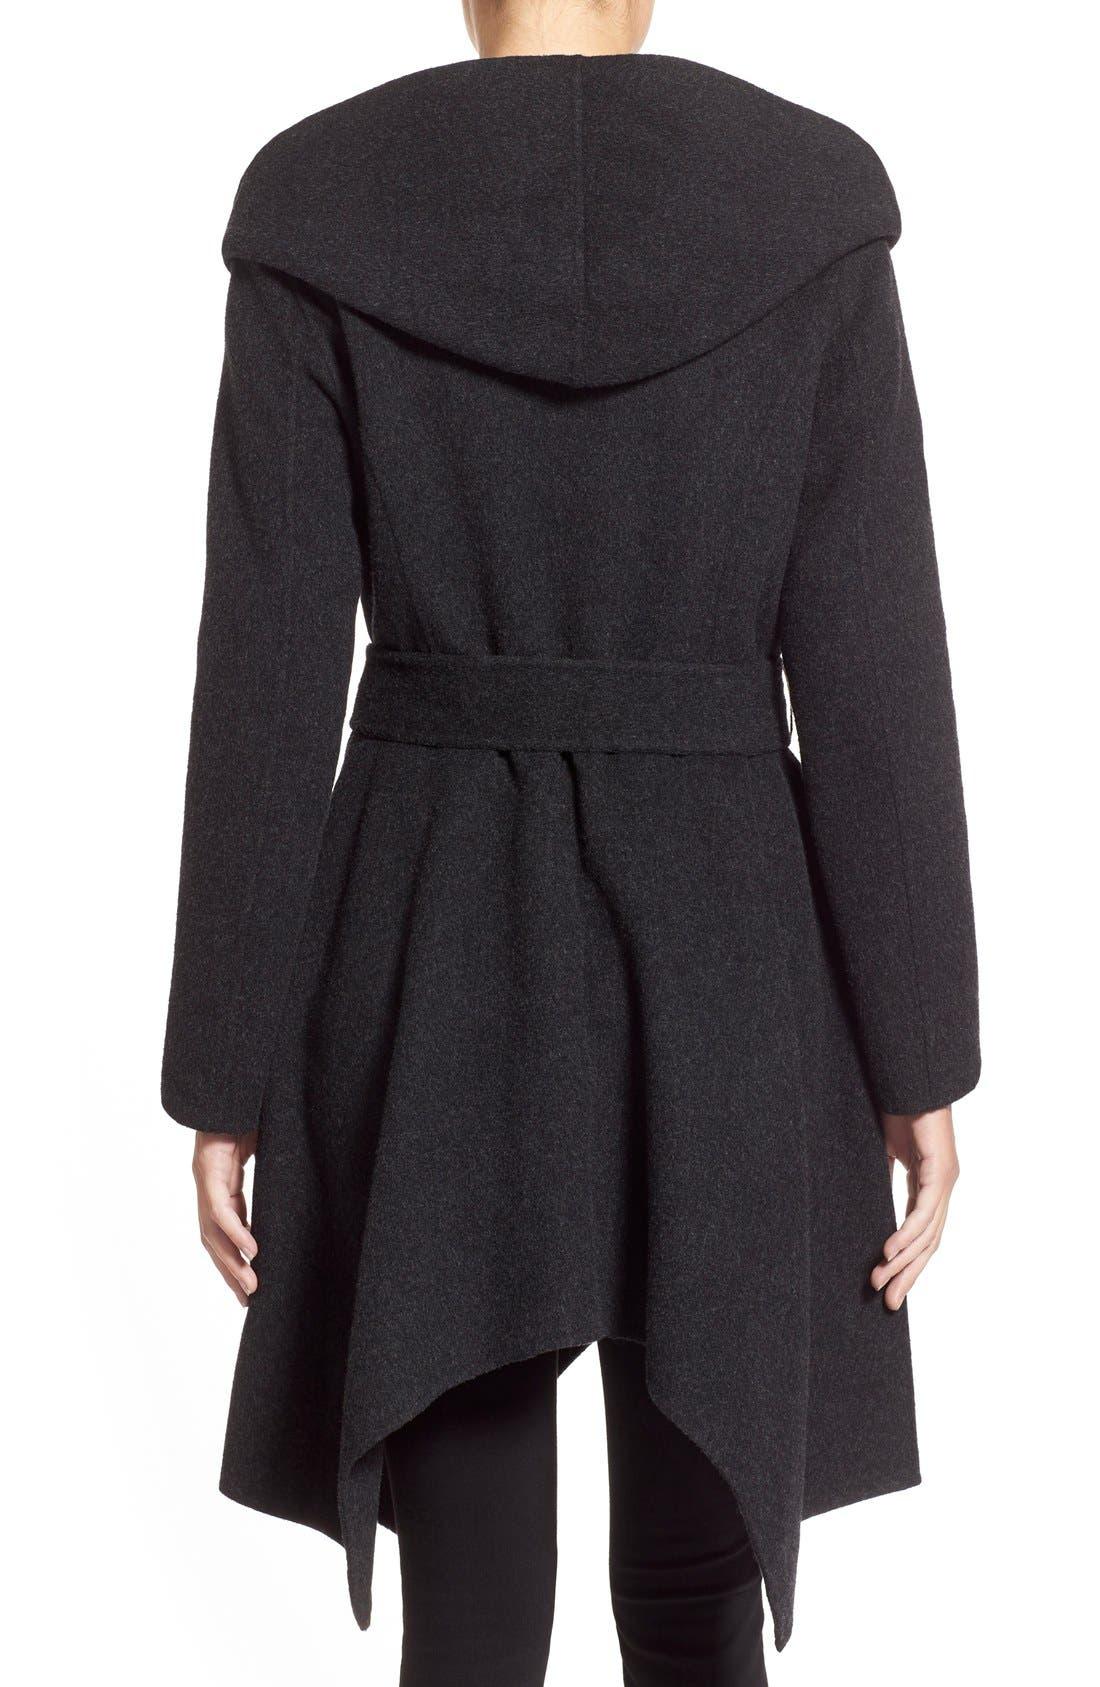 'Sophia' Belted Wool Blend Hooded Asymmetrical Coat,                             Alternate thumbnail 2, color,                             034